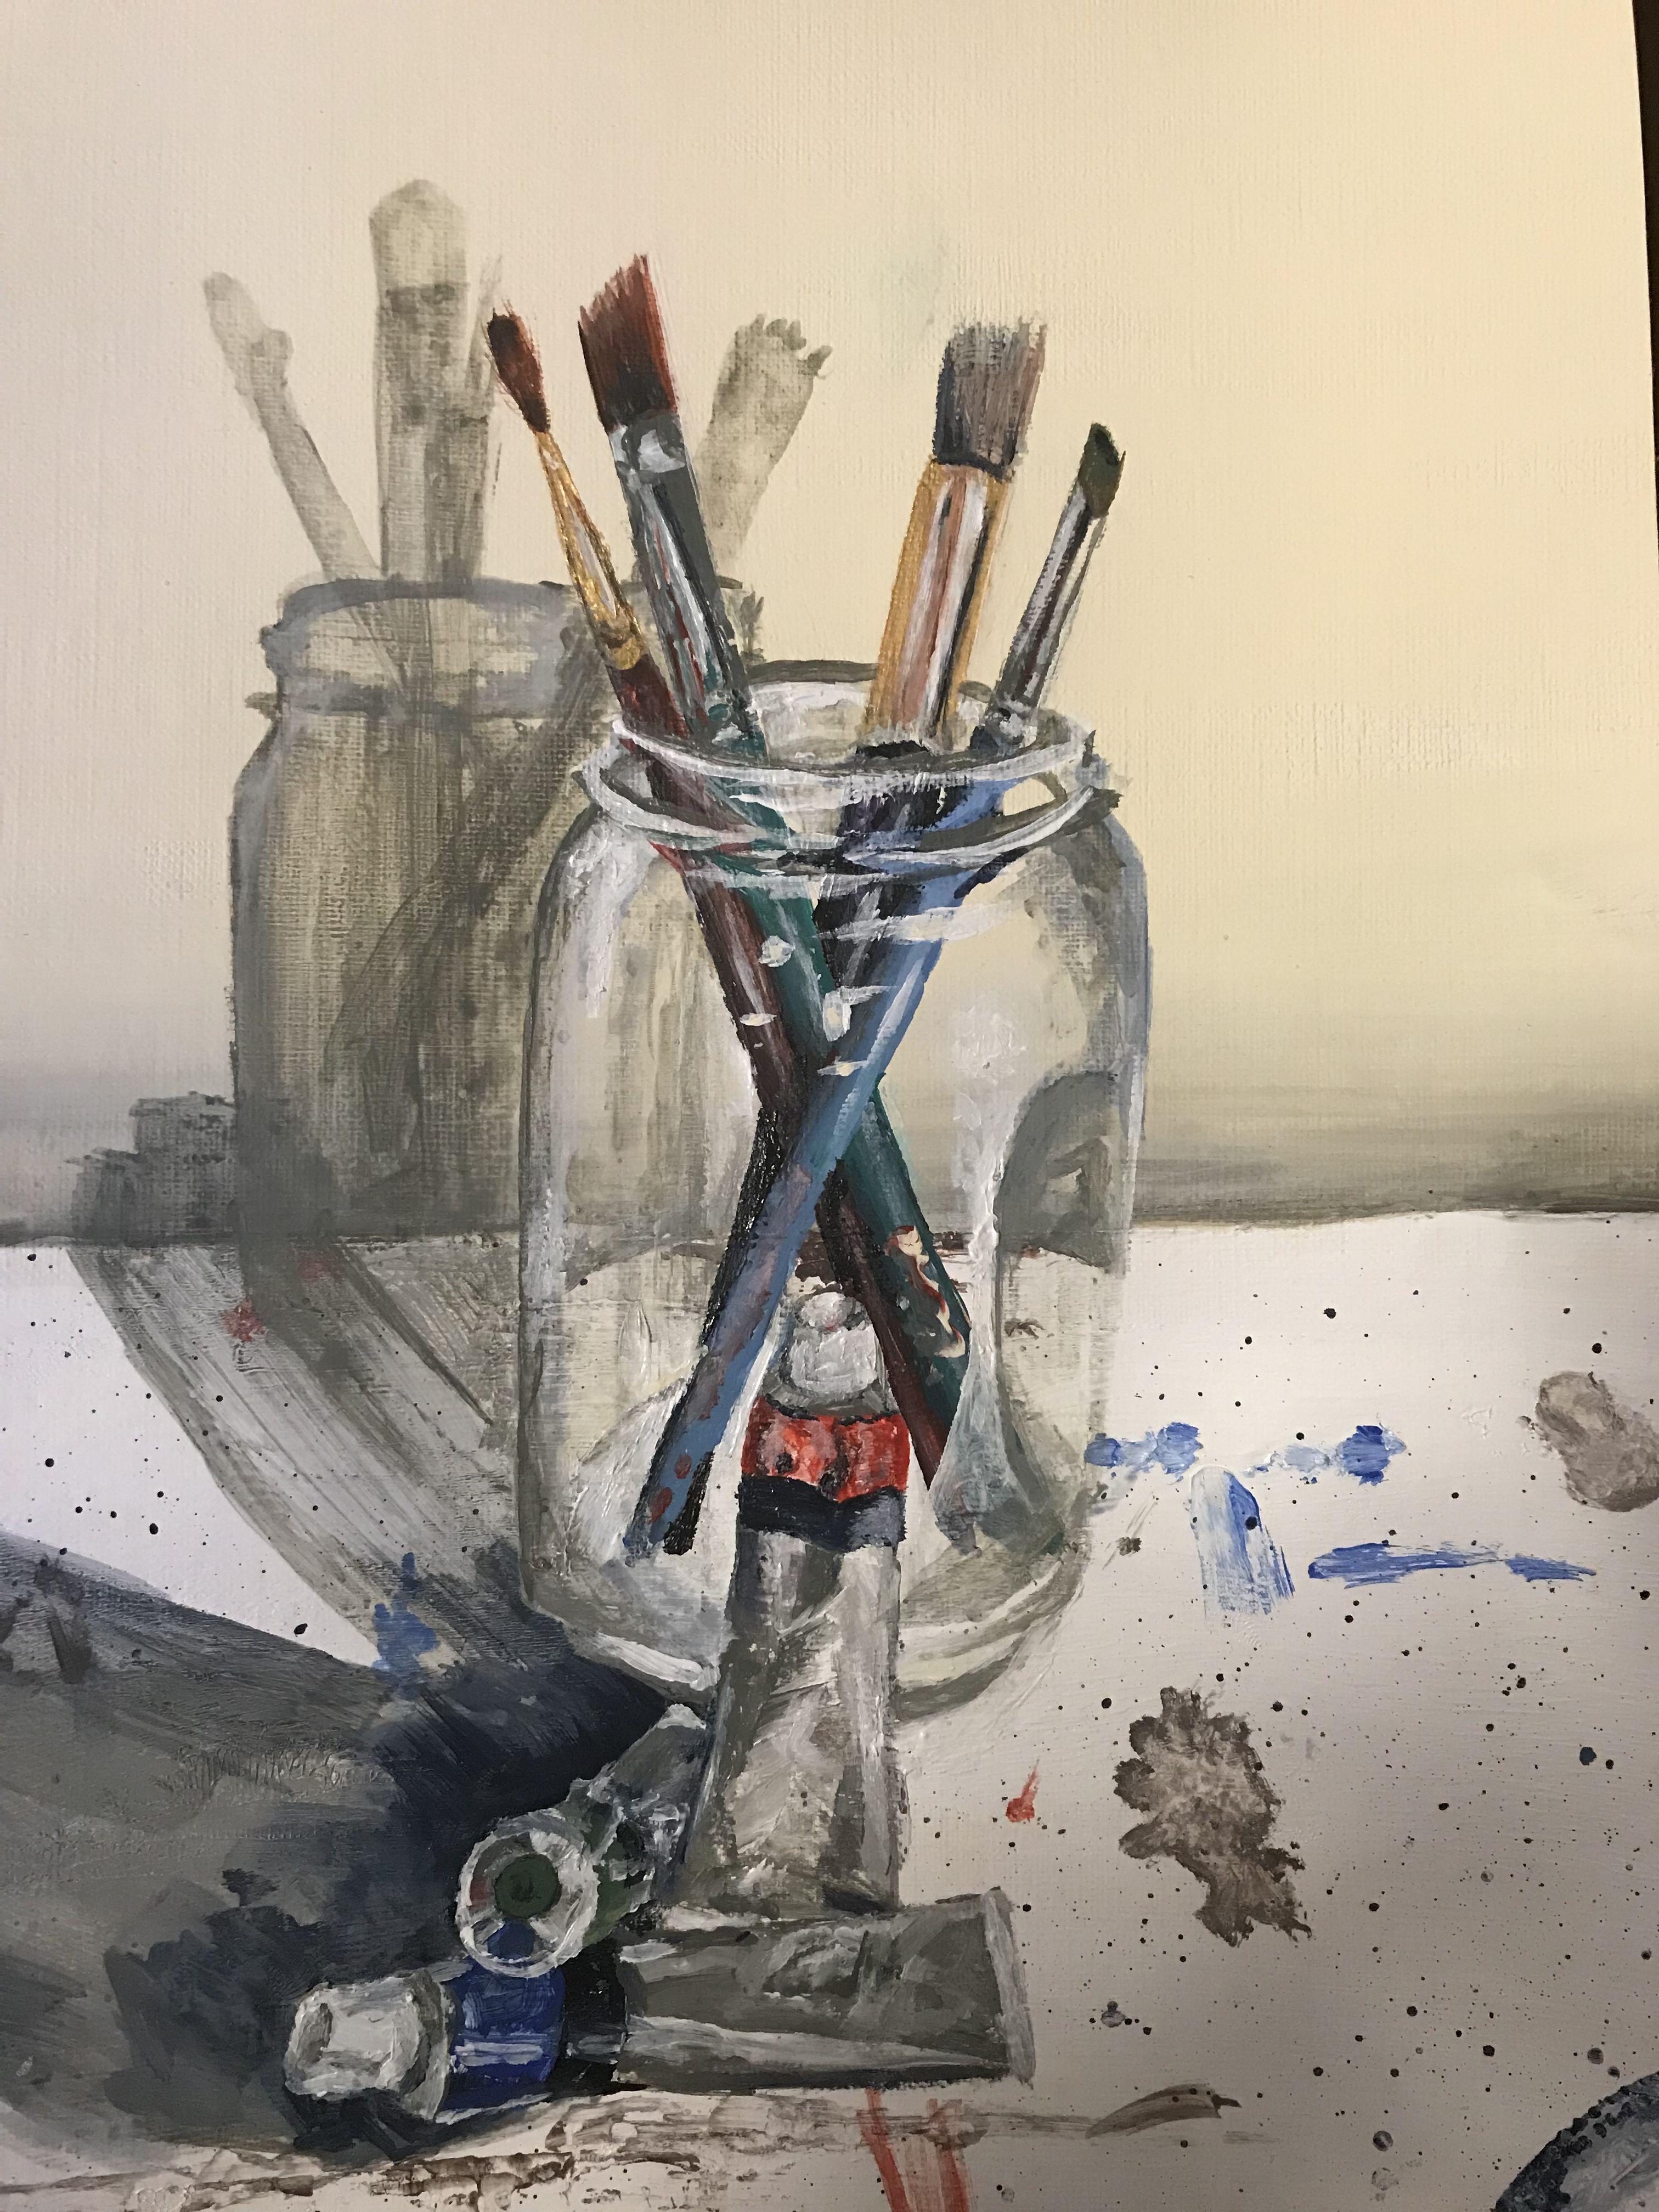 Mason Jar Still Life Realistic Painting By Allie Patten Painting Still Life Painting Realistic Paintings